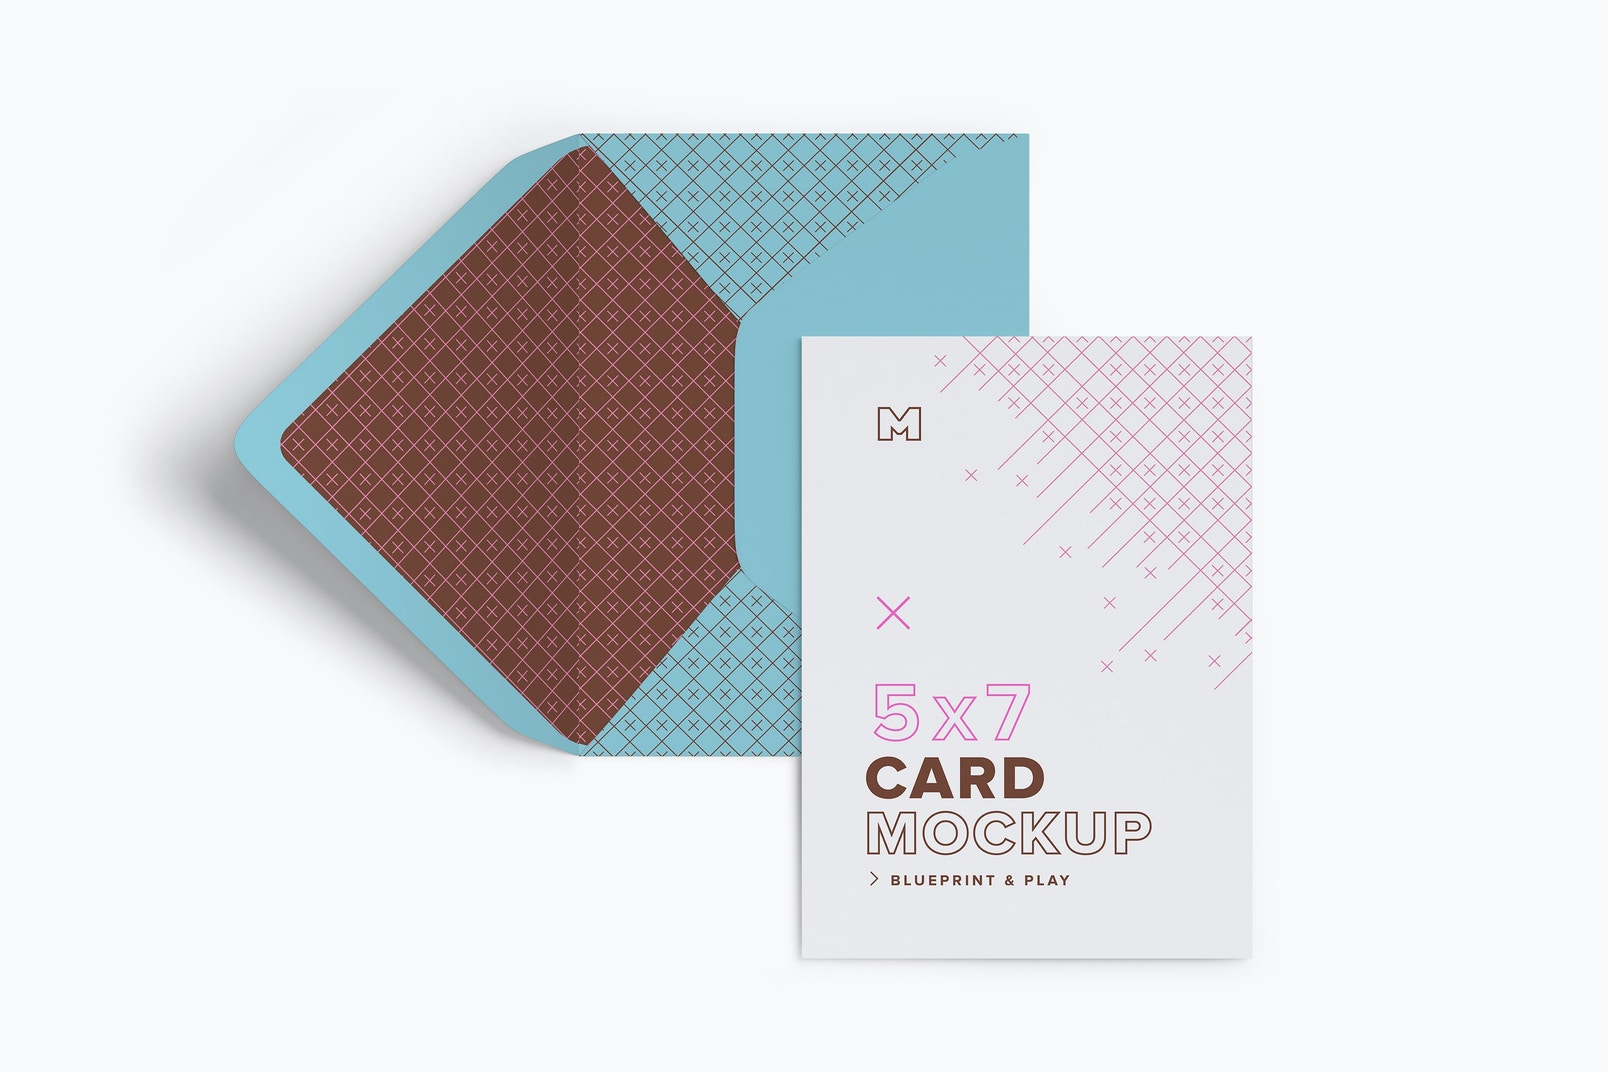 A7 Envelope and Portrait Card Mockup